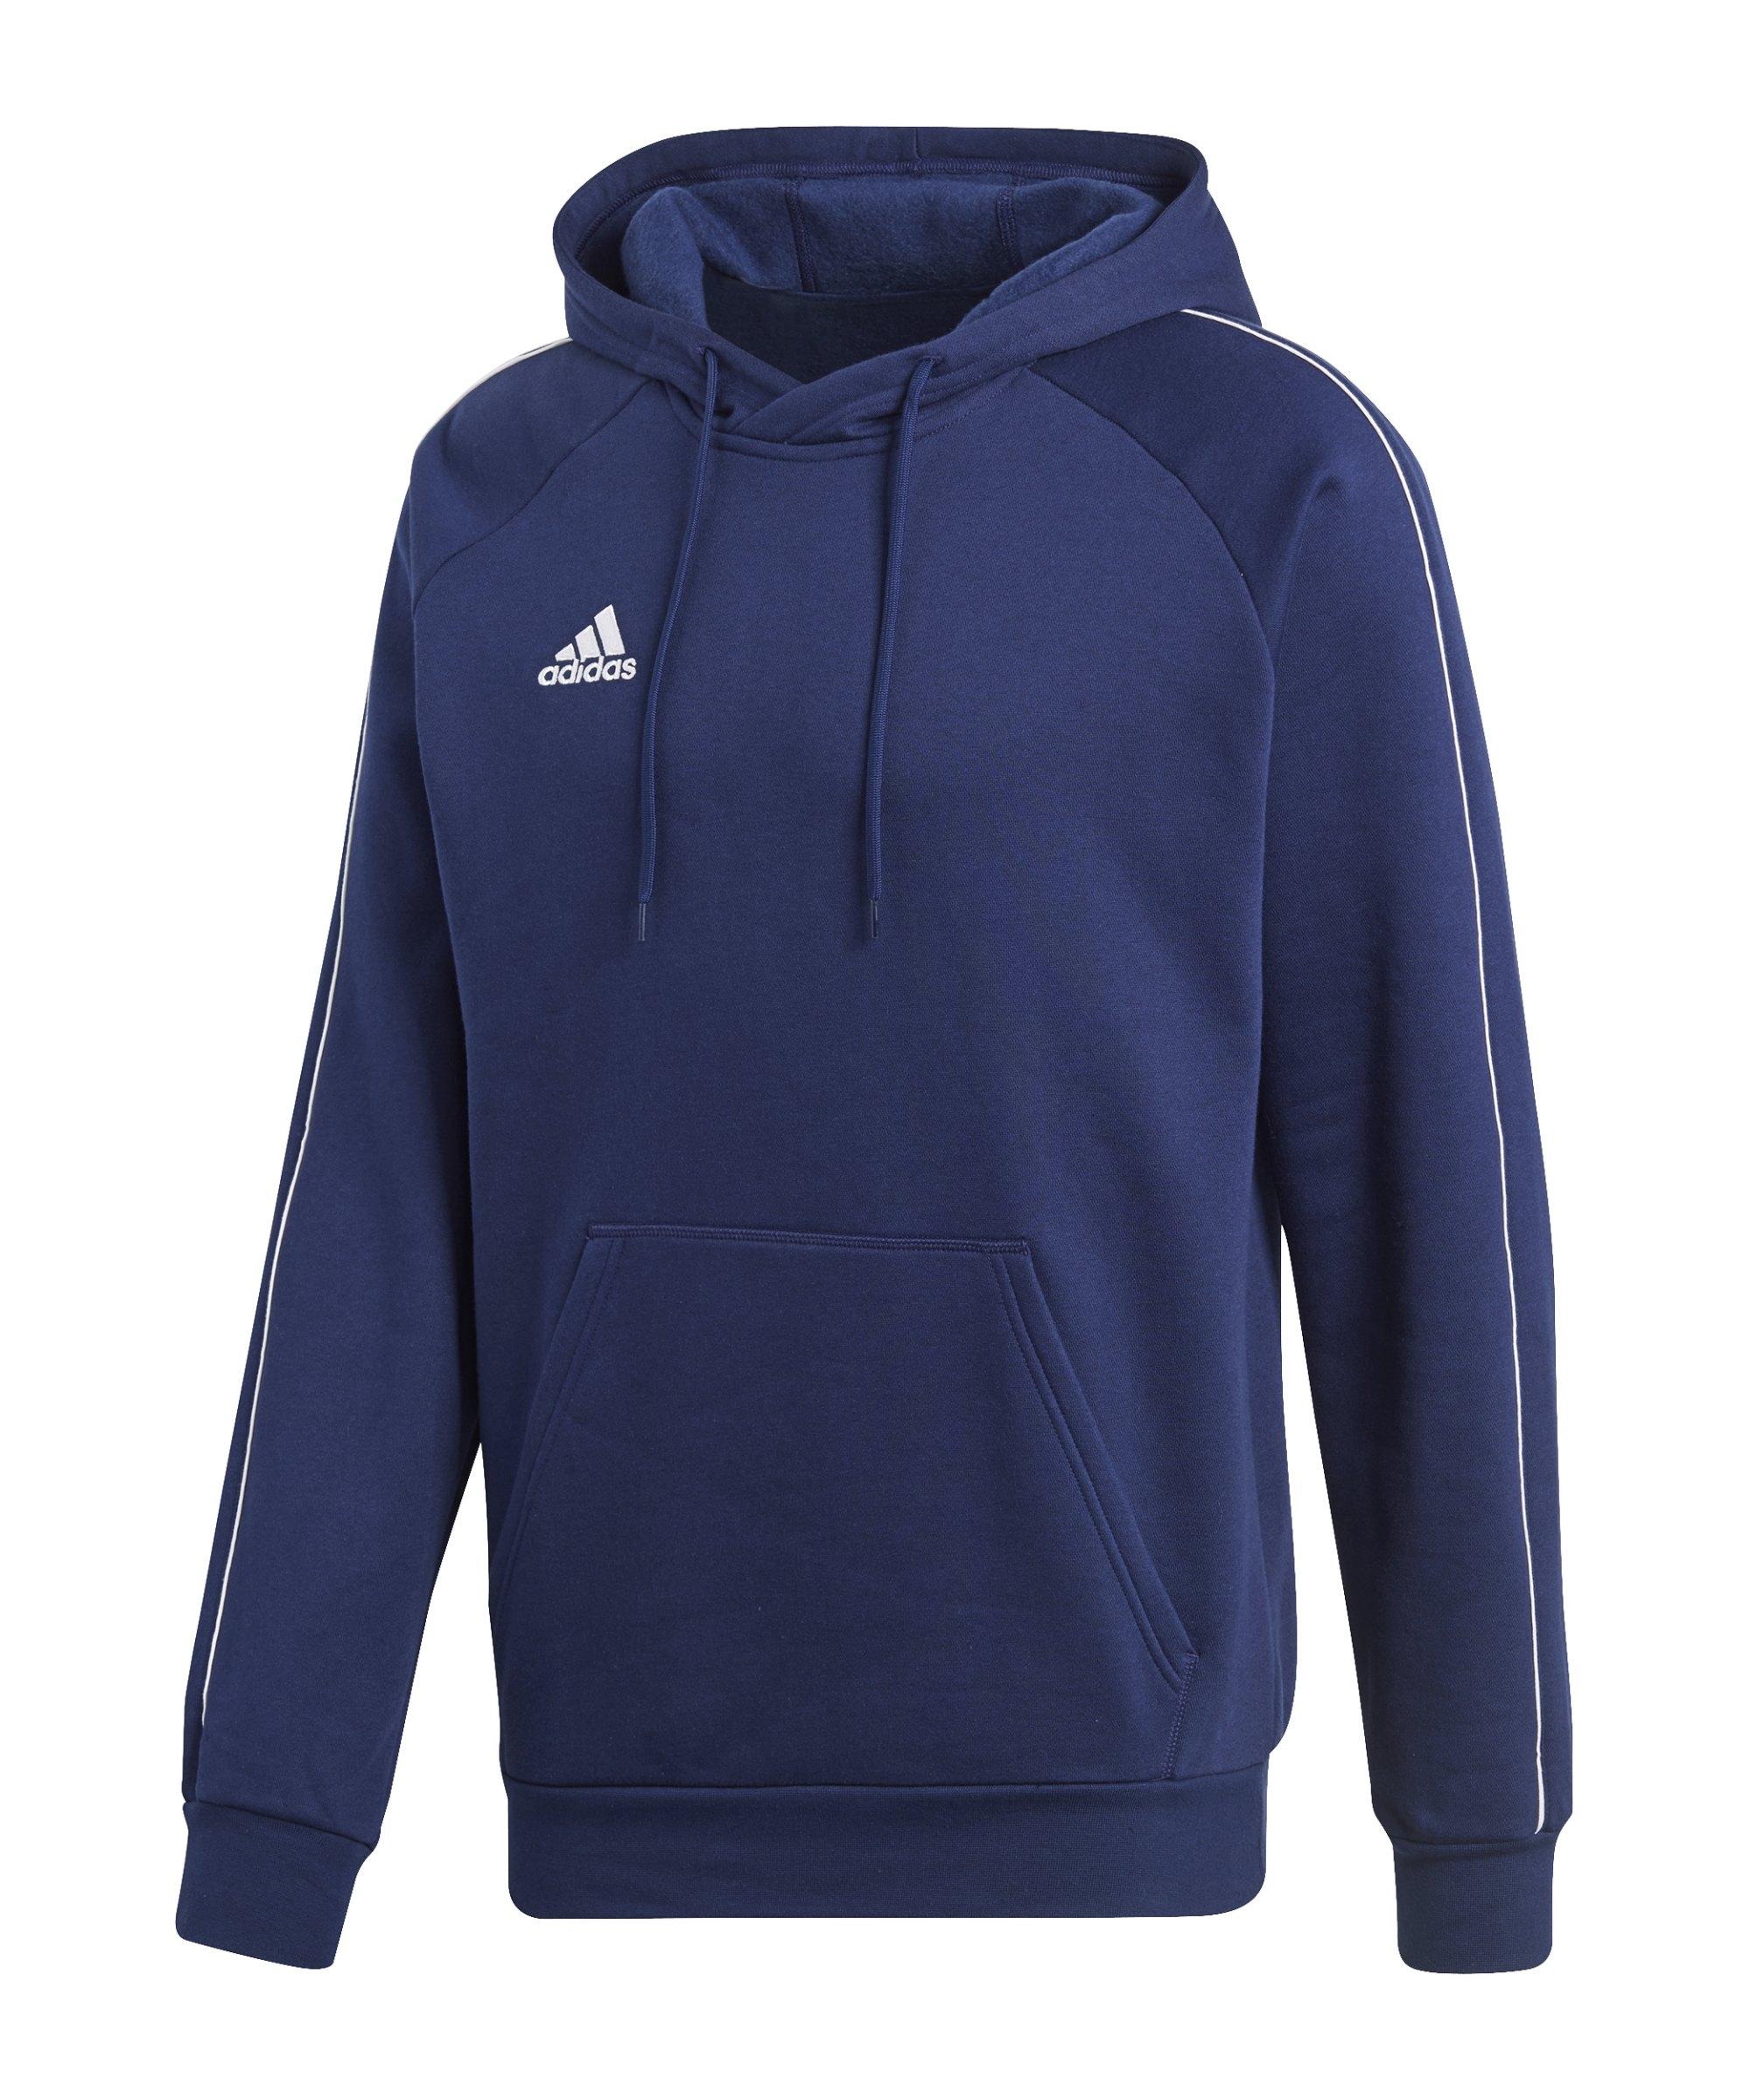 adidas core 18 hoody blau